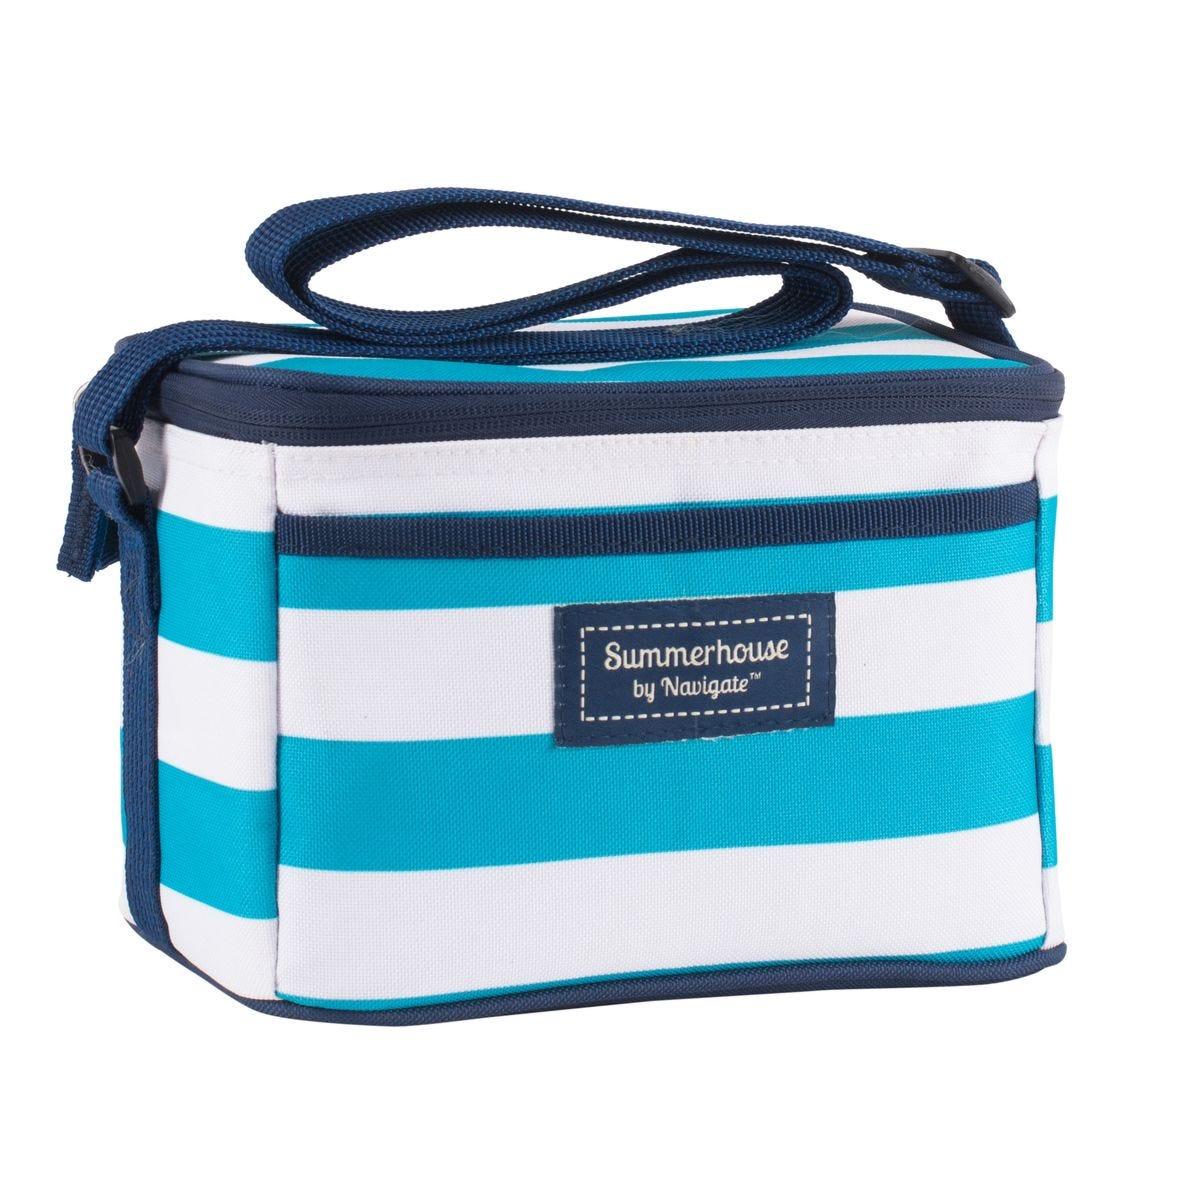 Summerhouse Coast 4L Personal Cool Bag - Aqua & White